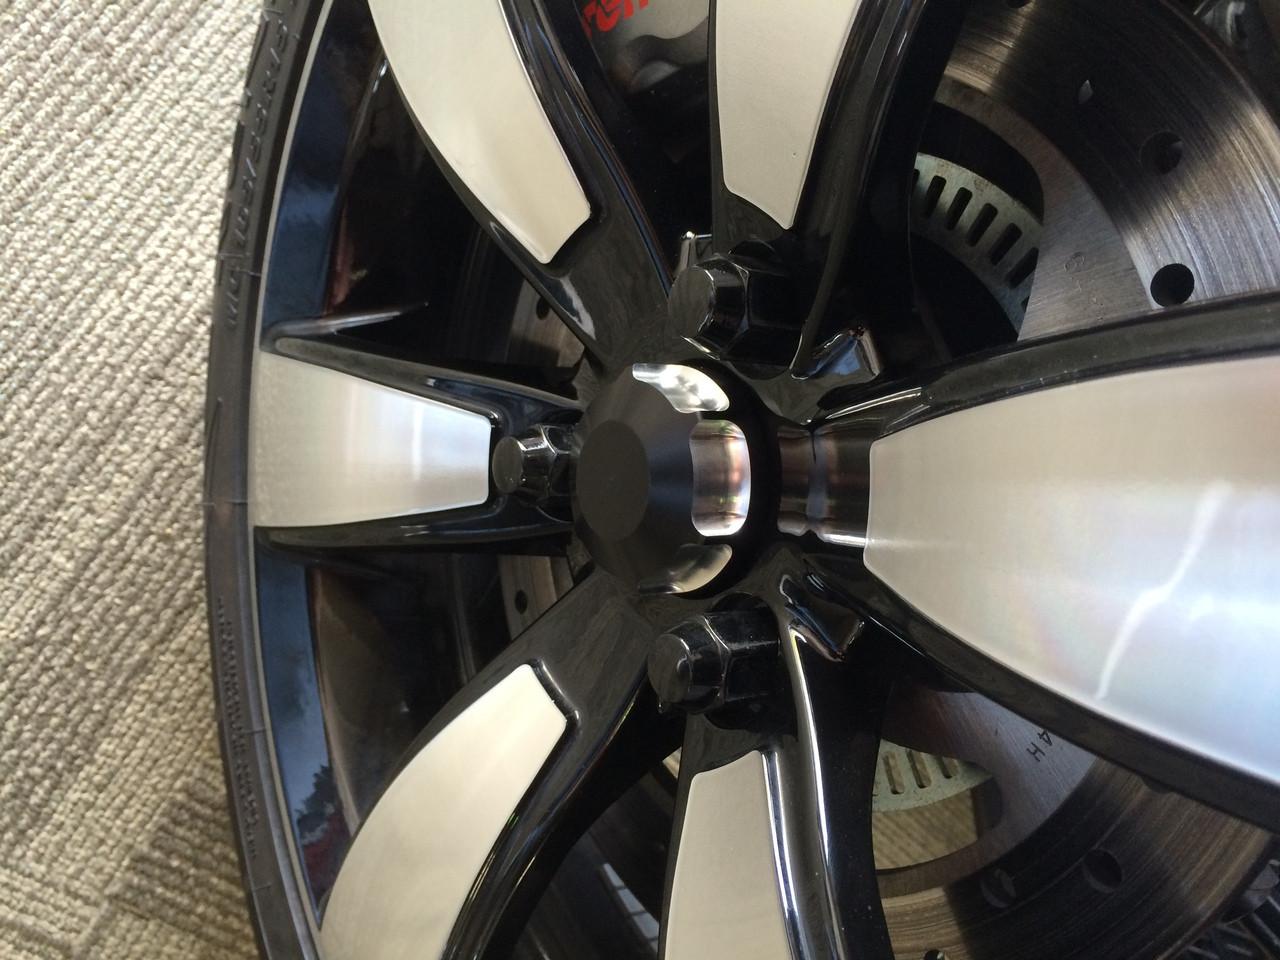 IPS Wheel Caps (outside)